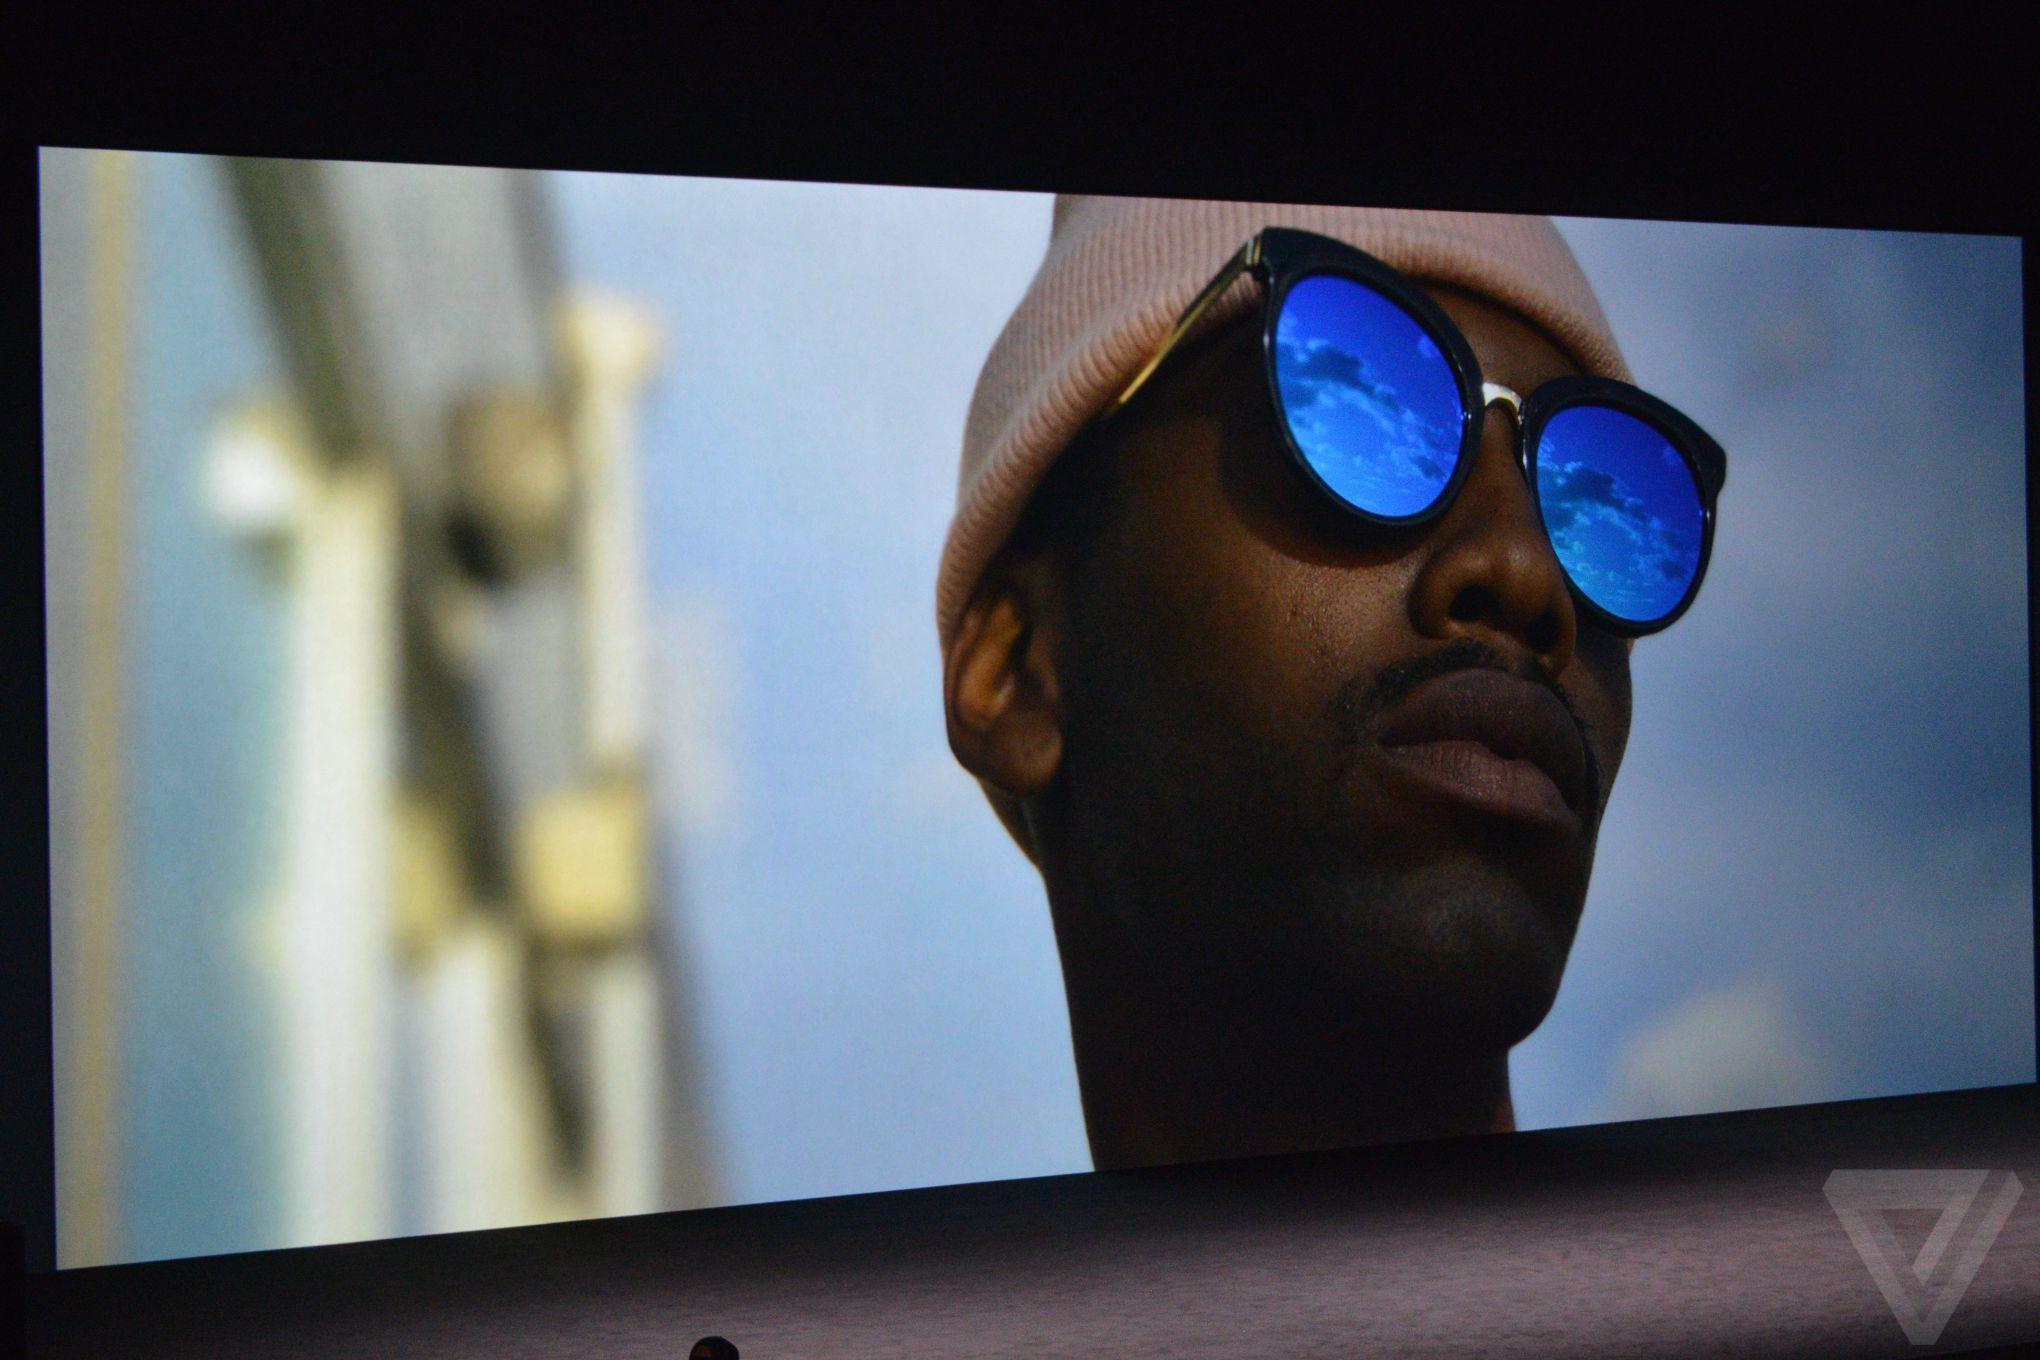 apple-iphone-watch-20160907-5015